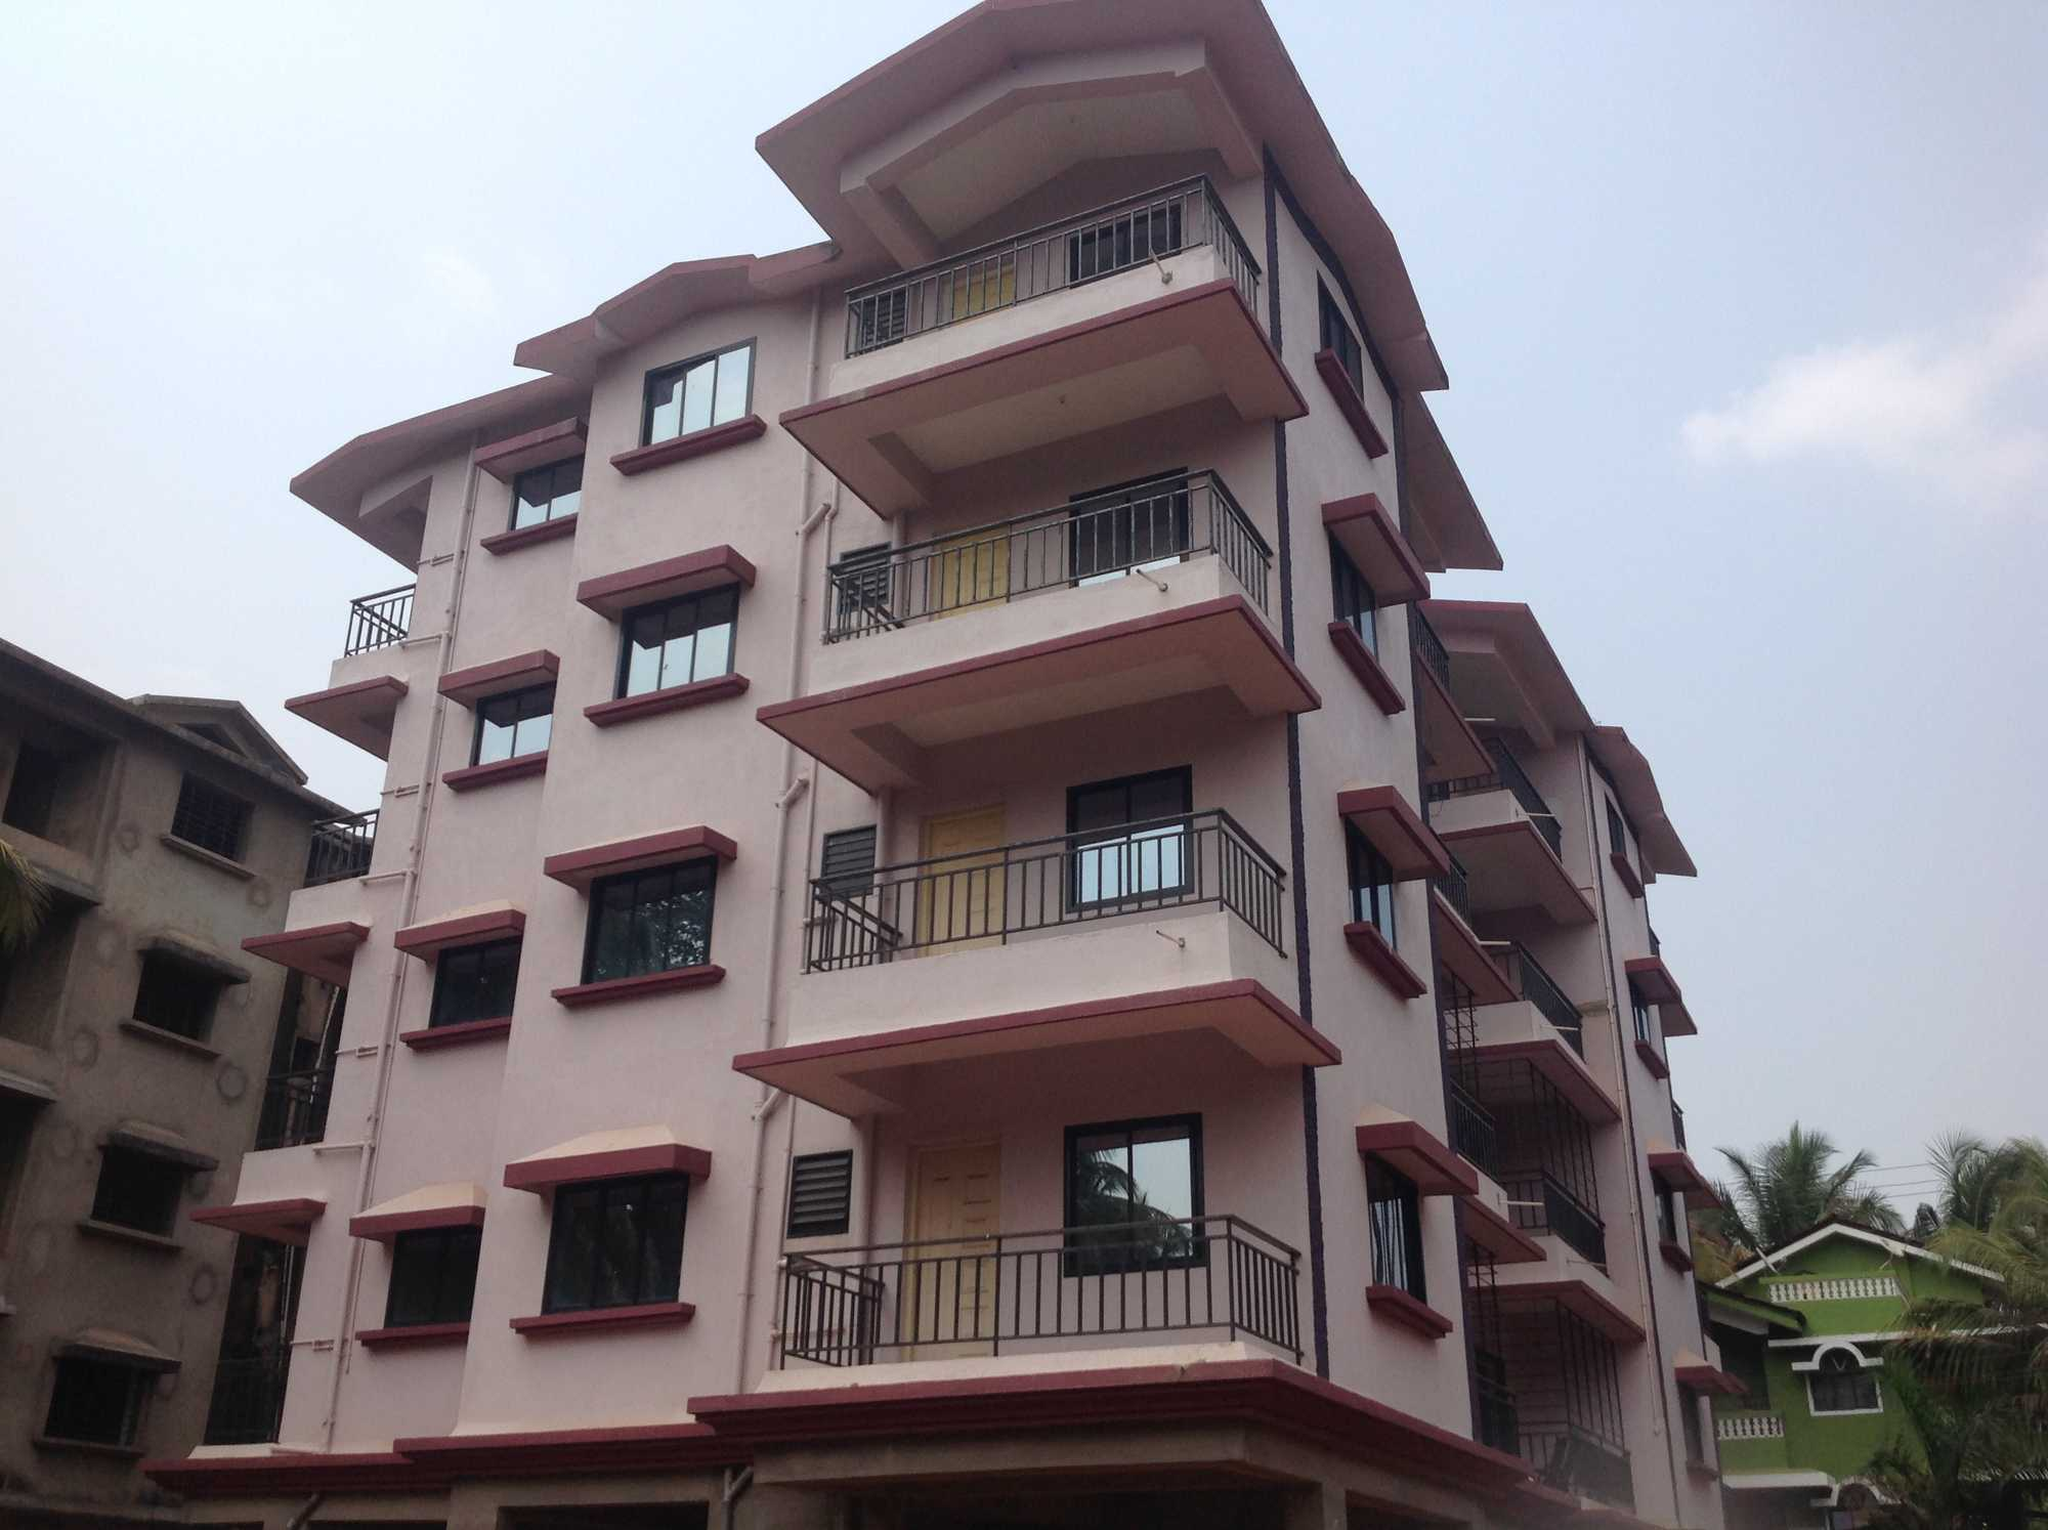 Top 100 Construction Companies in Goa - Best Construction